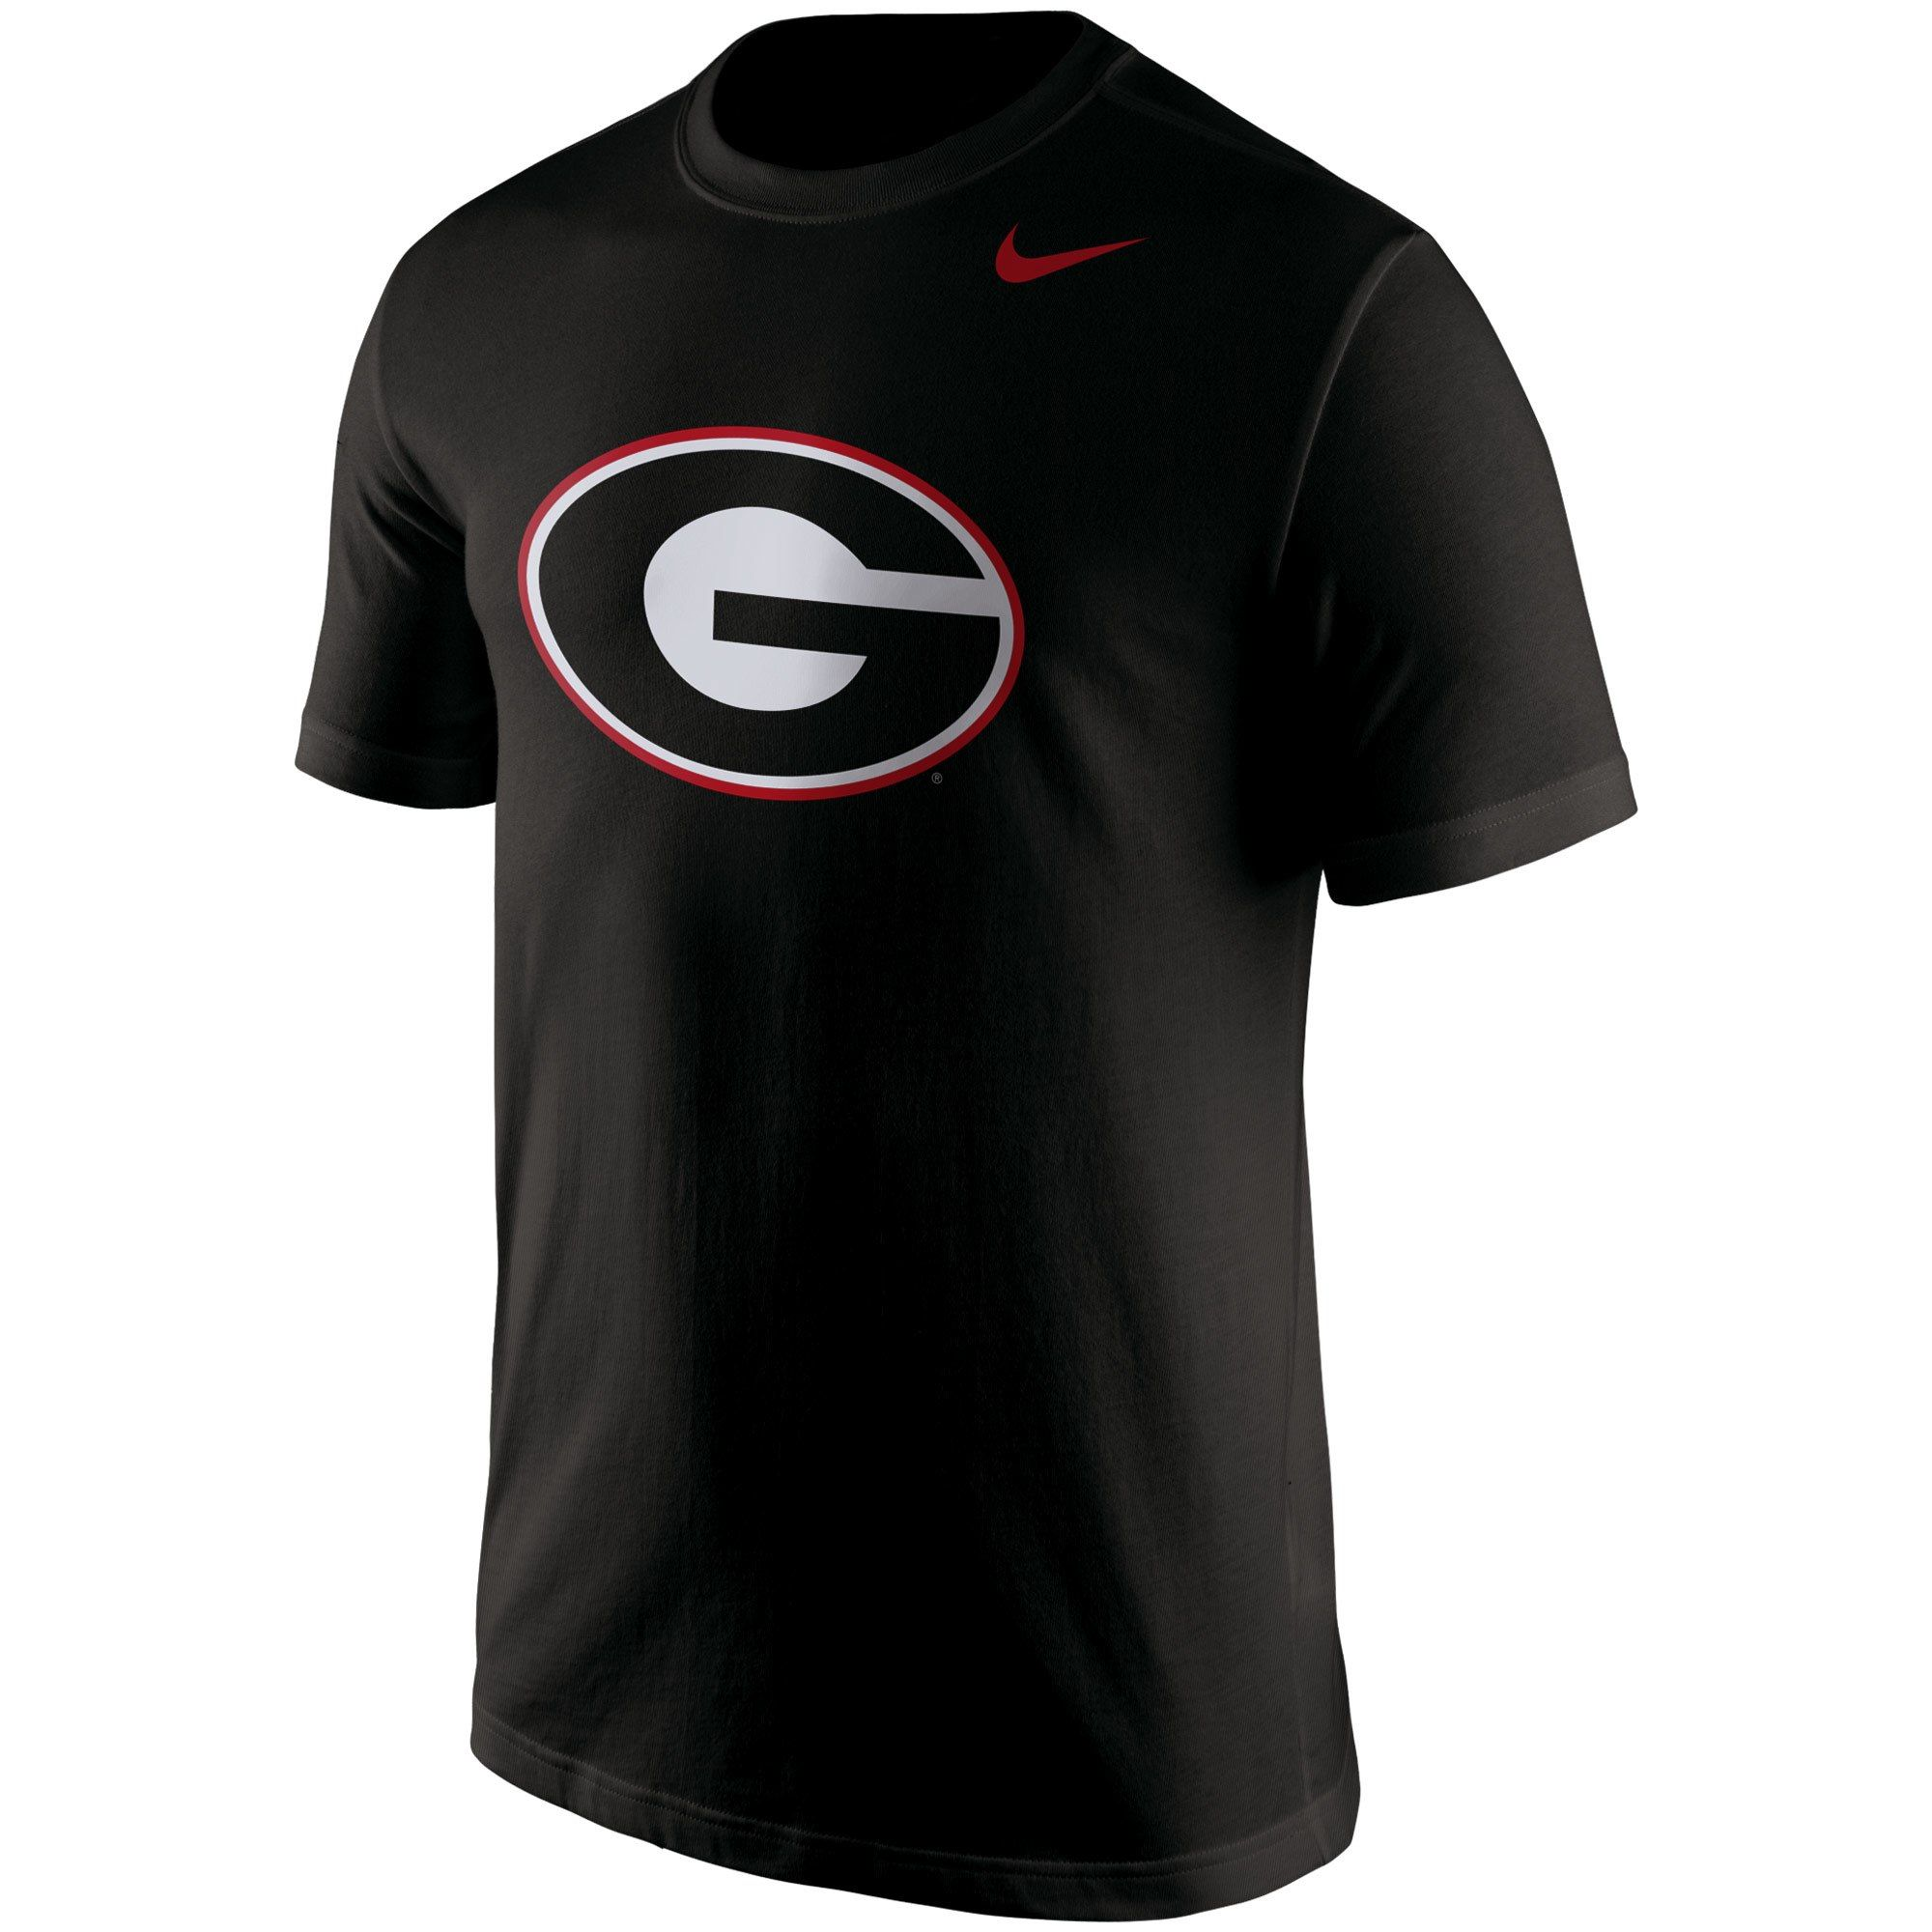 Nike Georgia Bulldogs Youth Black Cotton Logo T Shirt